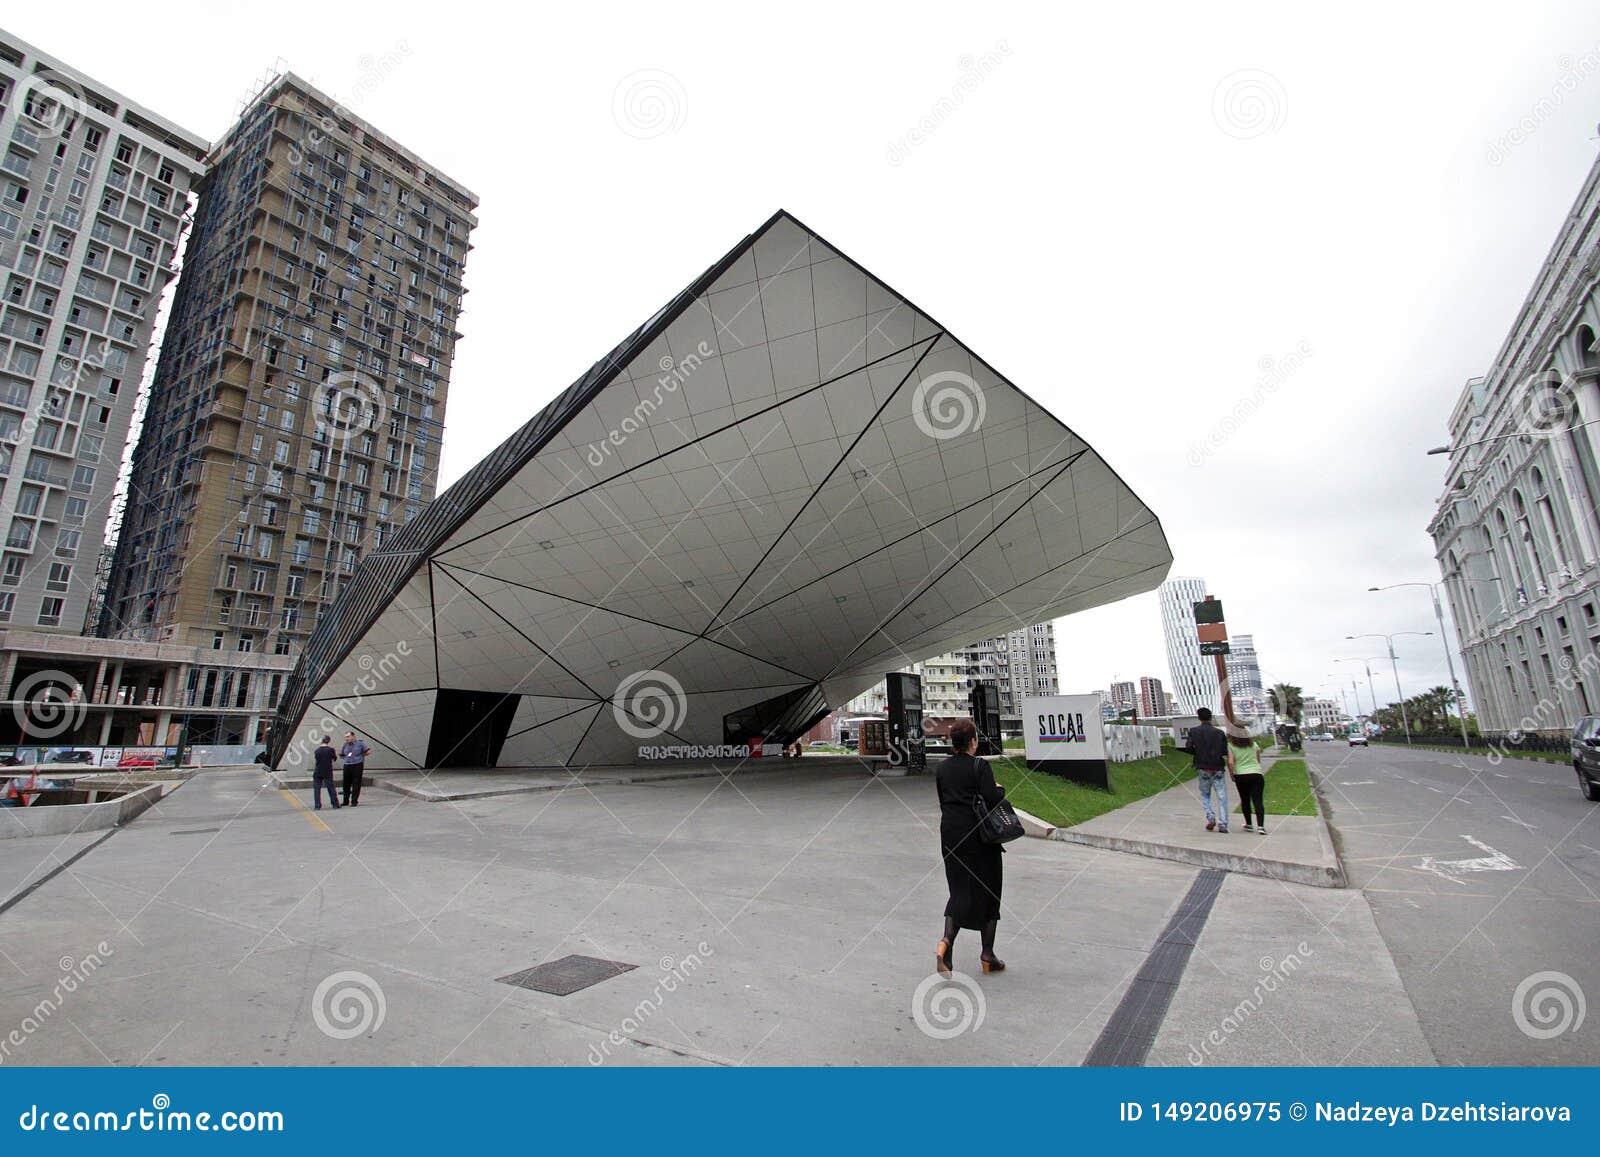 Mcdonald dans la ville de Batumi en G?orgie